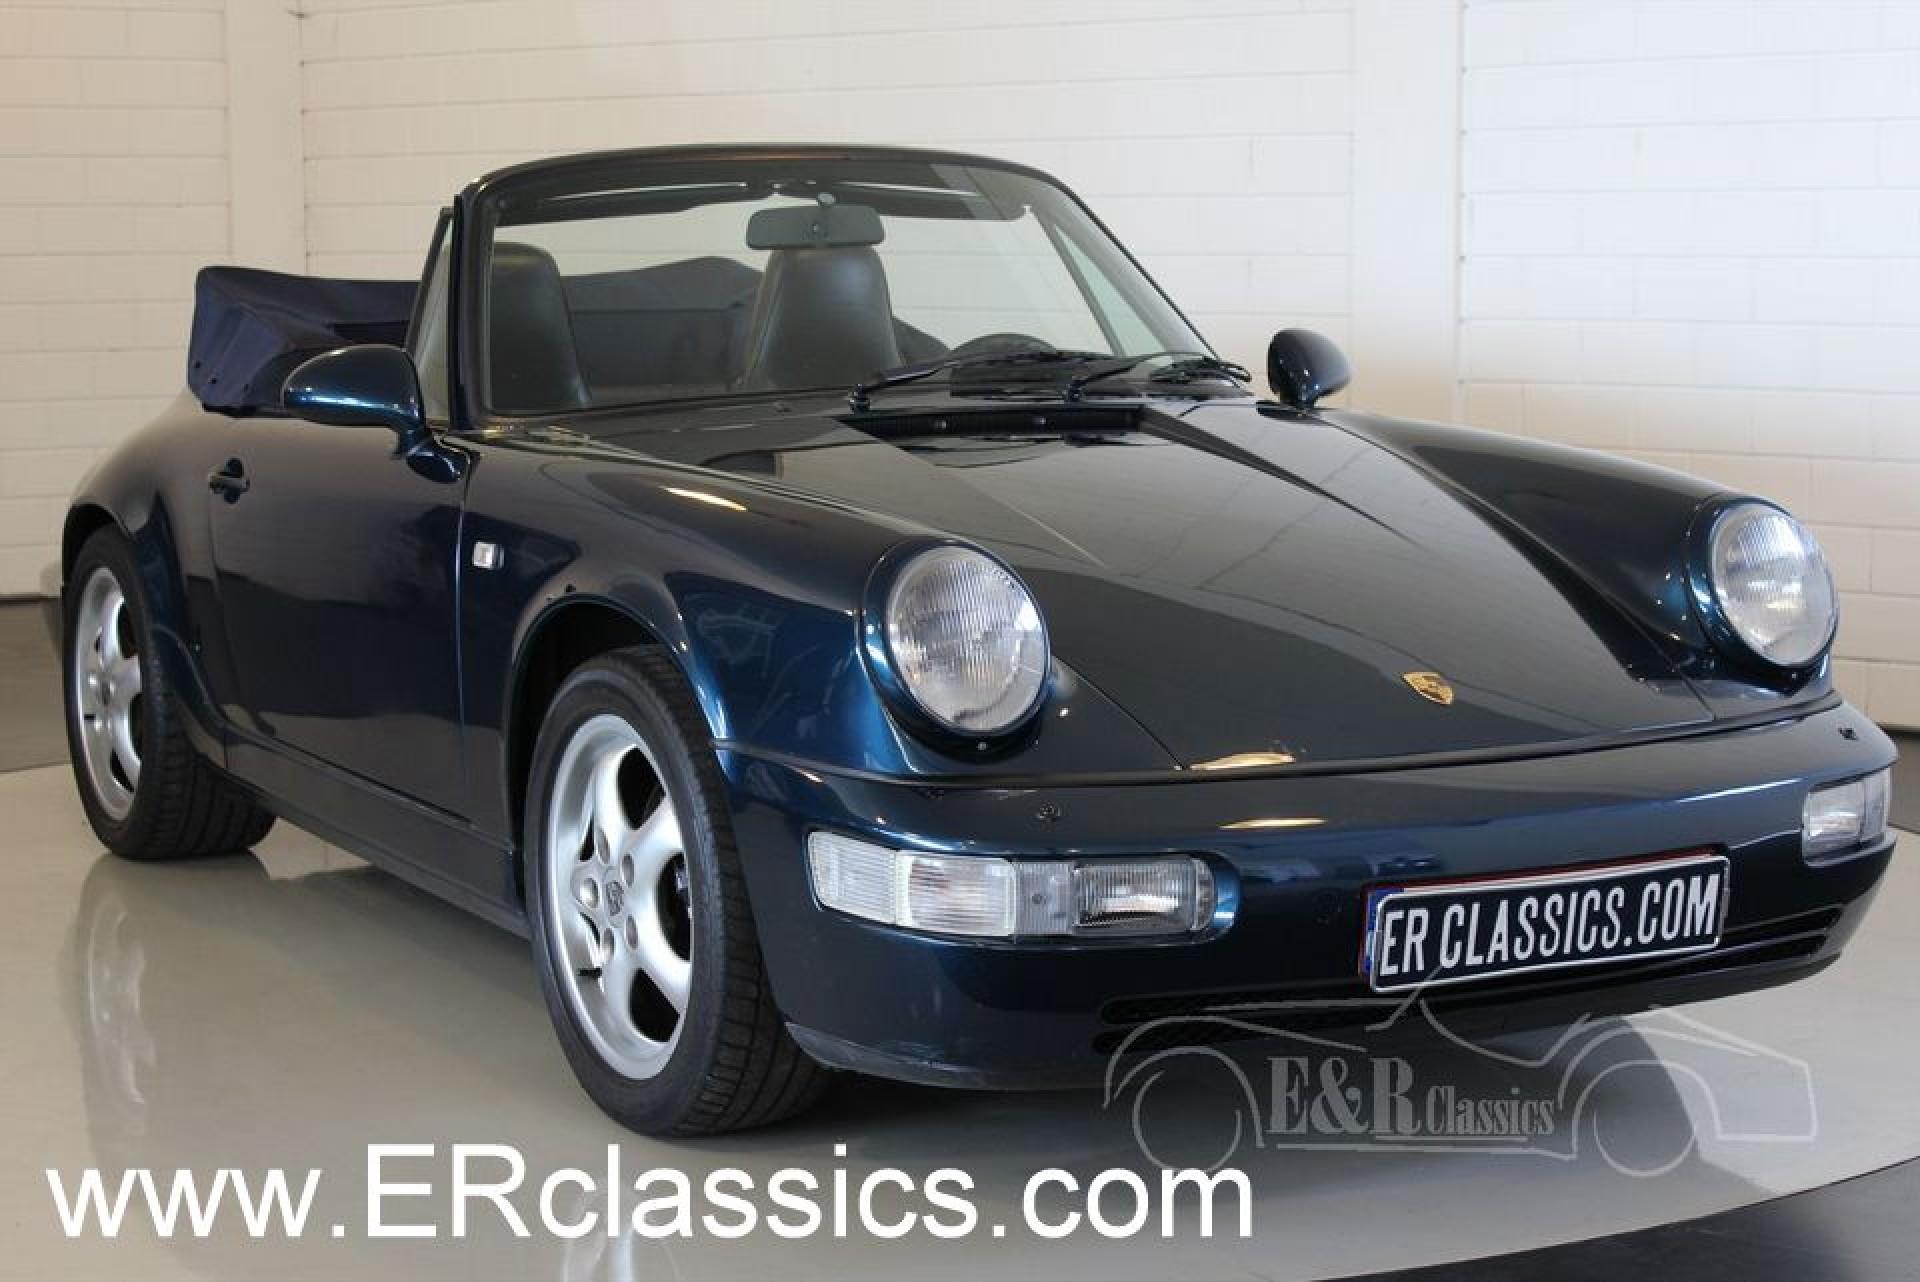 porsche 911 964 carrera 2 cabriolet 1991 for sale - Porsche Ancienne